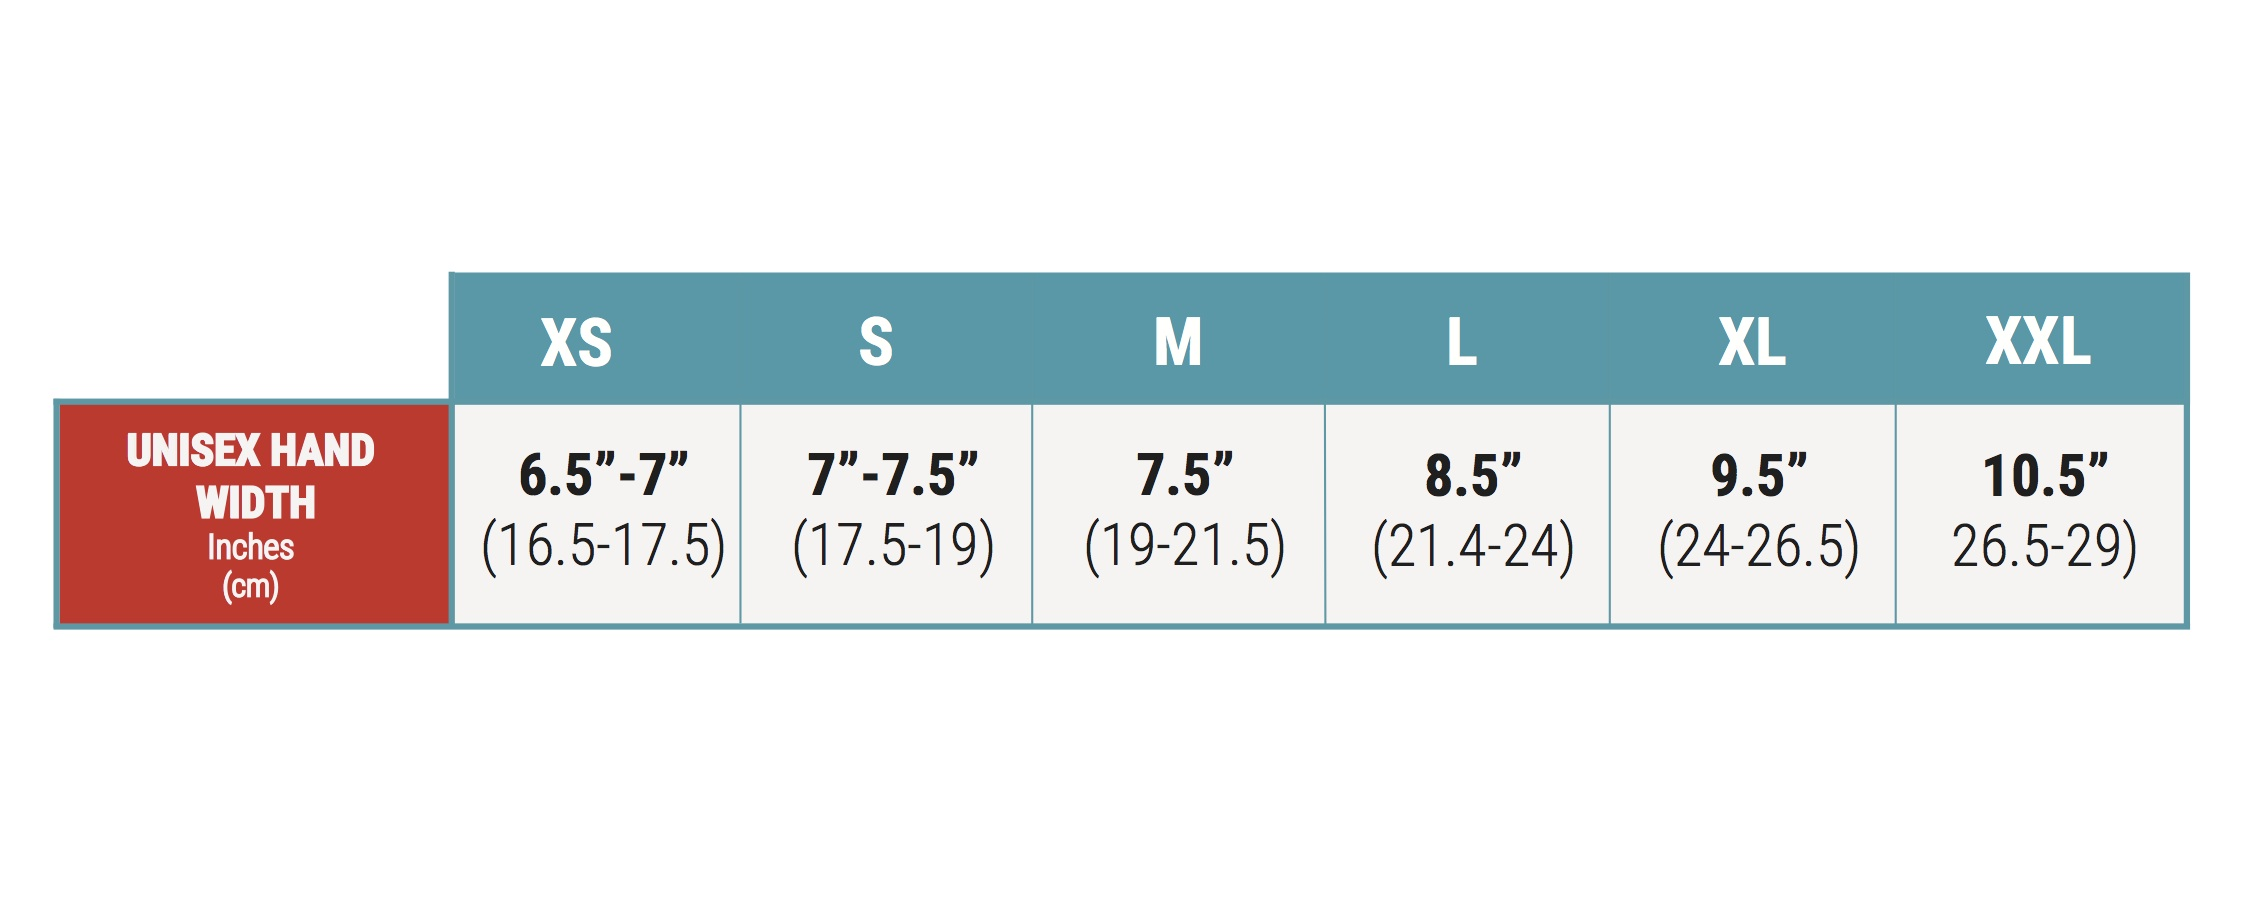 wcs-gill-glove-sizing-chart.jpg